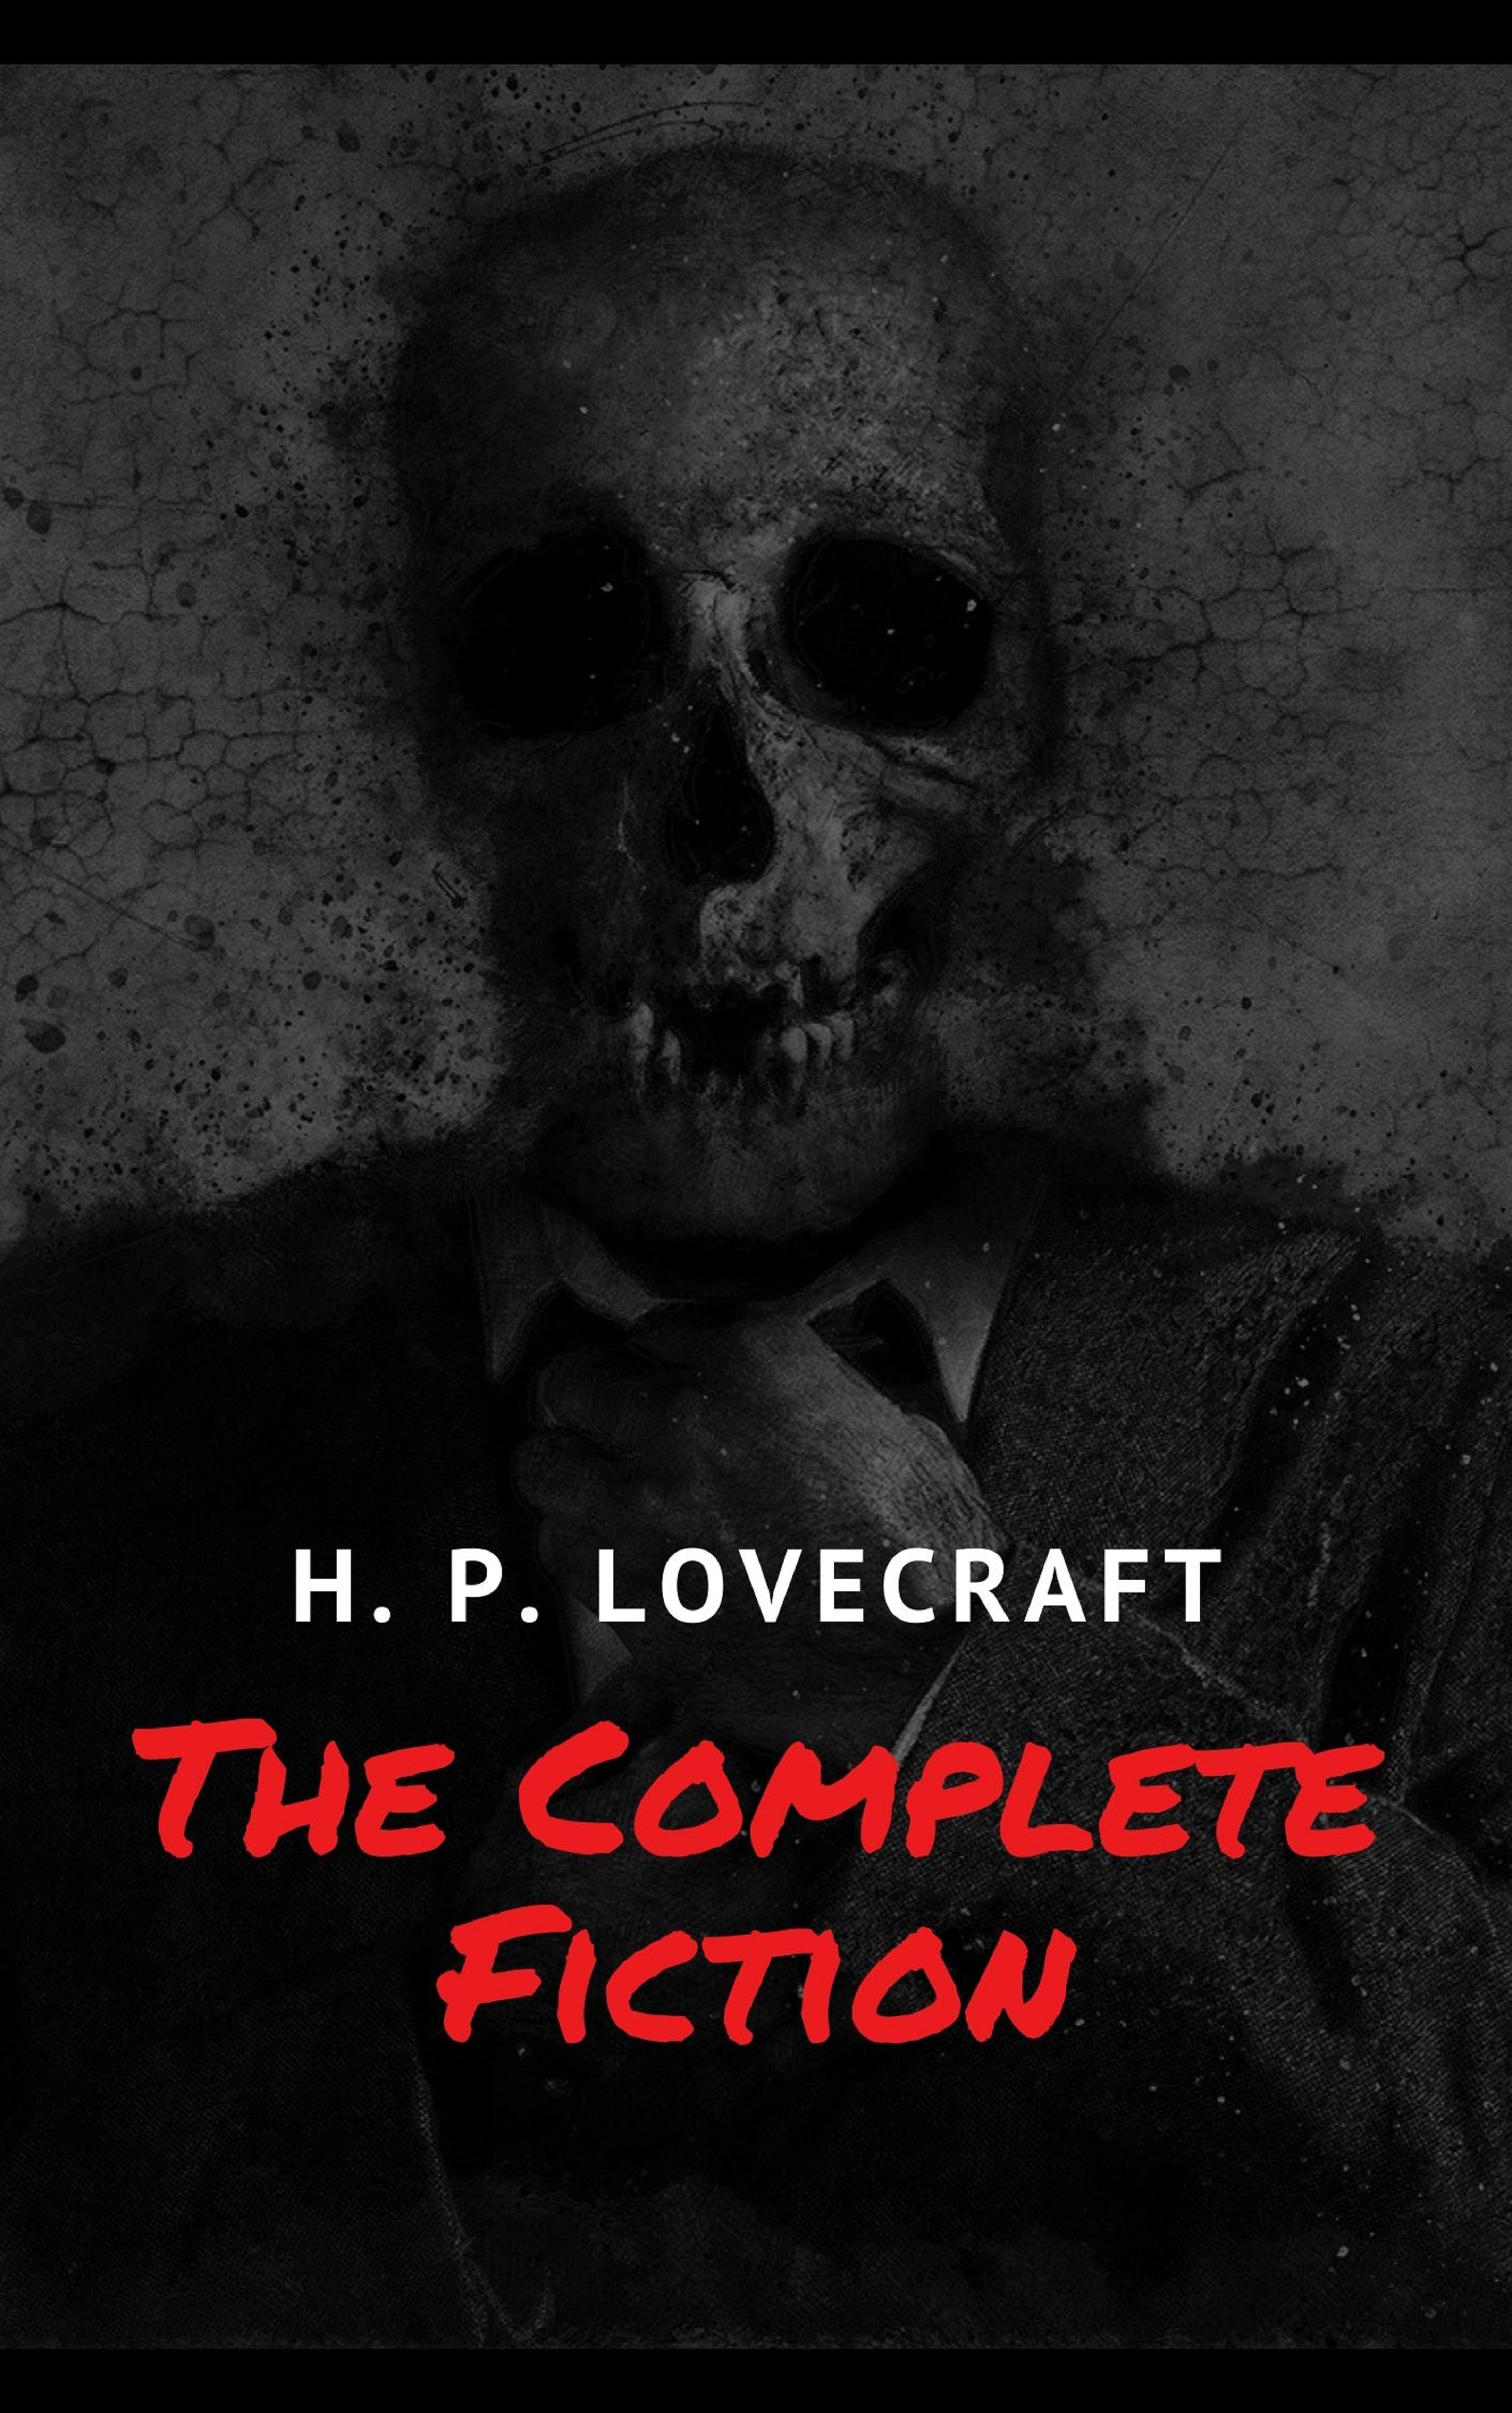 Говард Филлипс Лавкрафт The Complete Fiction of H. P. Lovecraft h p lovecraft the complete fiction of h p lovecraft